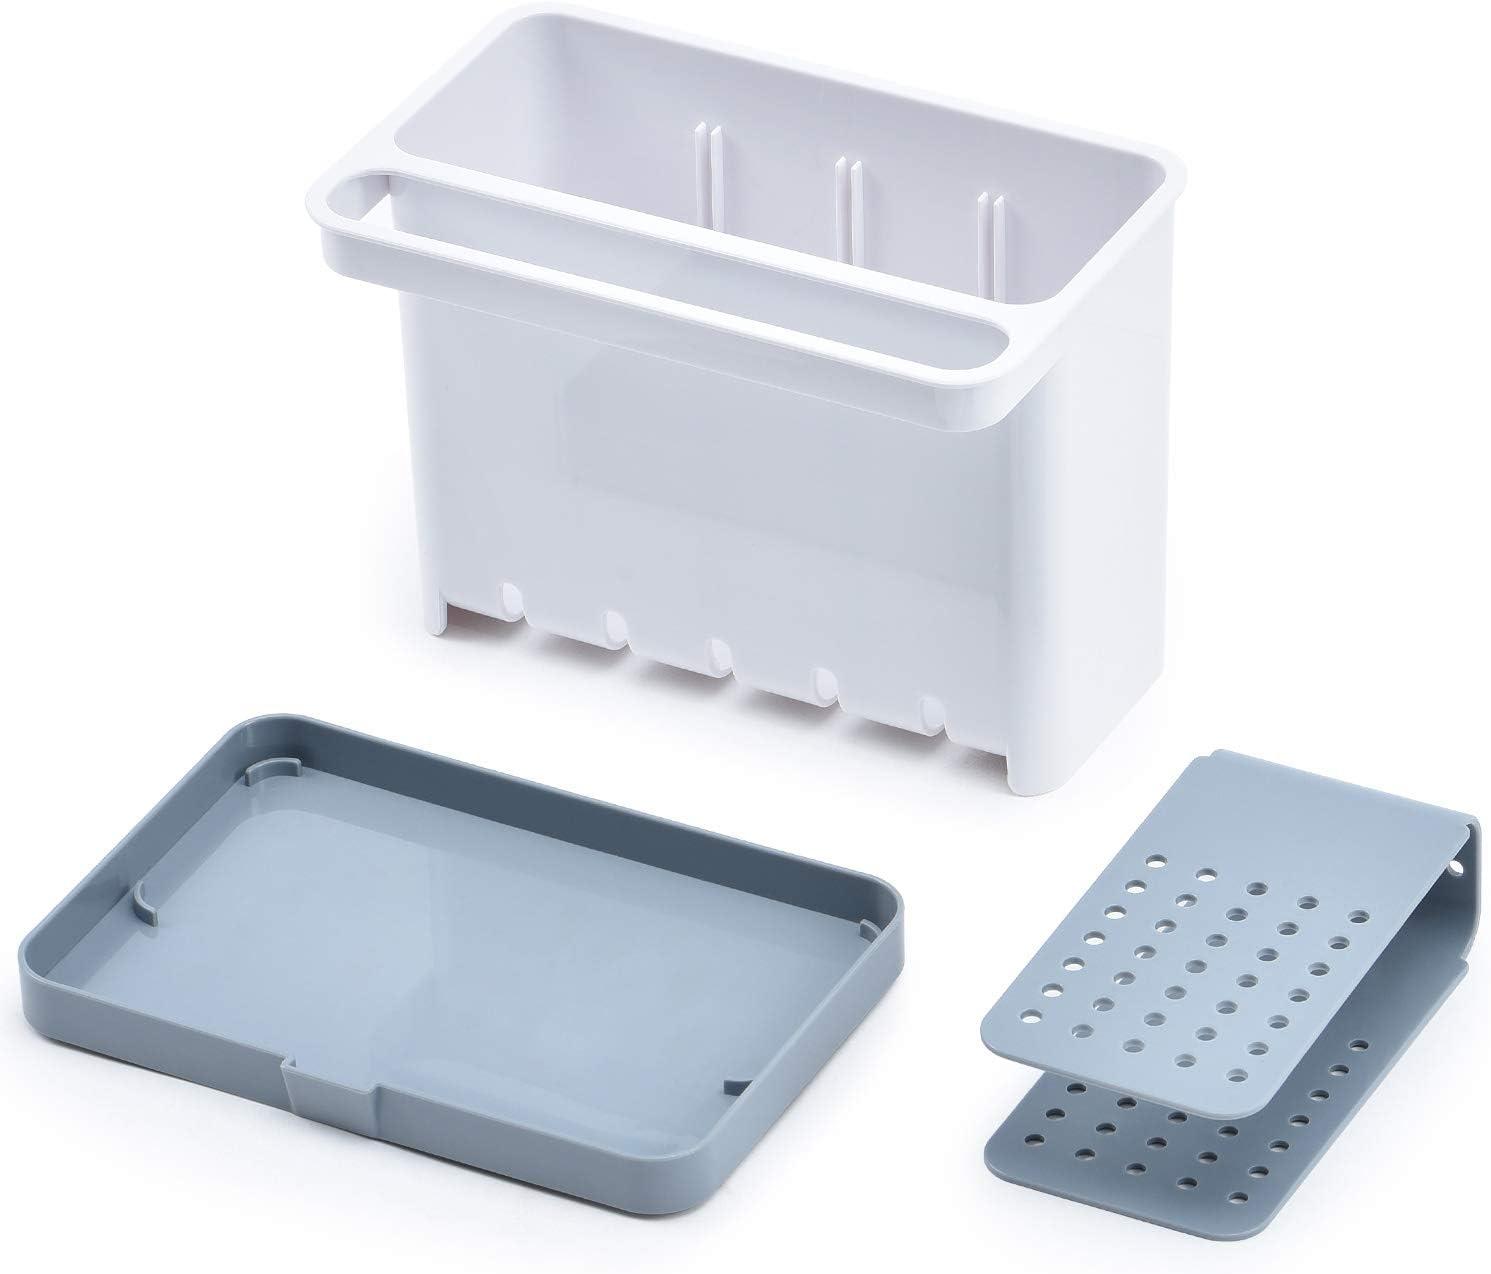 Kingrack Organizador de Utensilios de Fregadero,Organizador Utensilios,ABS,Cocina,17.5x12x13.5 cm Caddy Organizador de utensilios